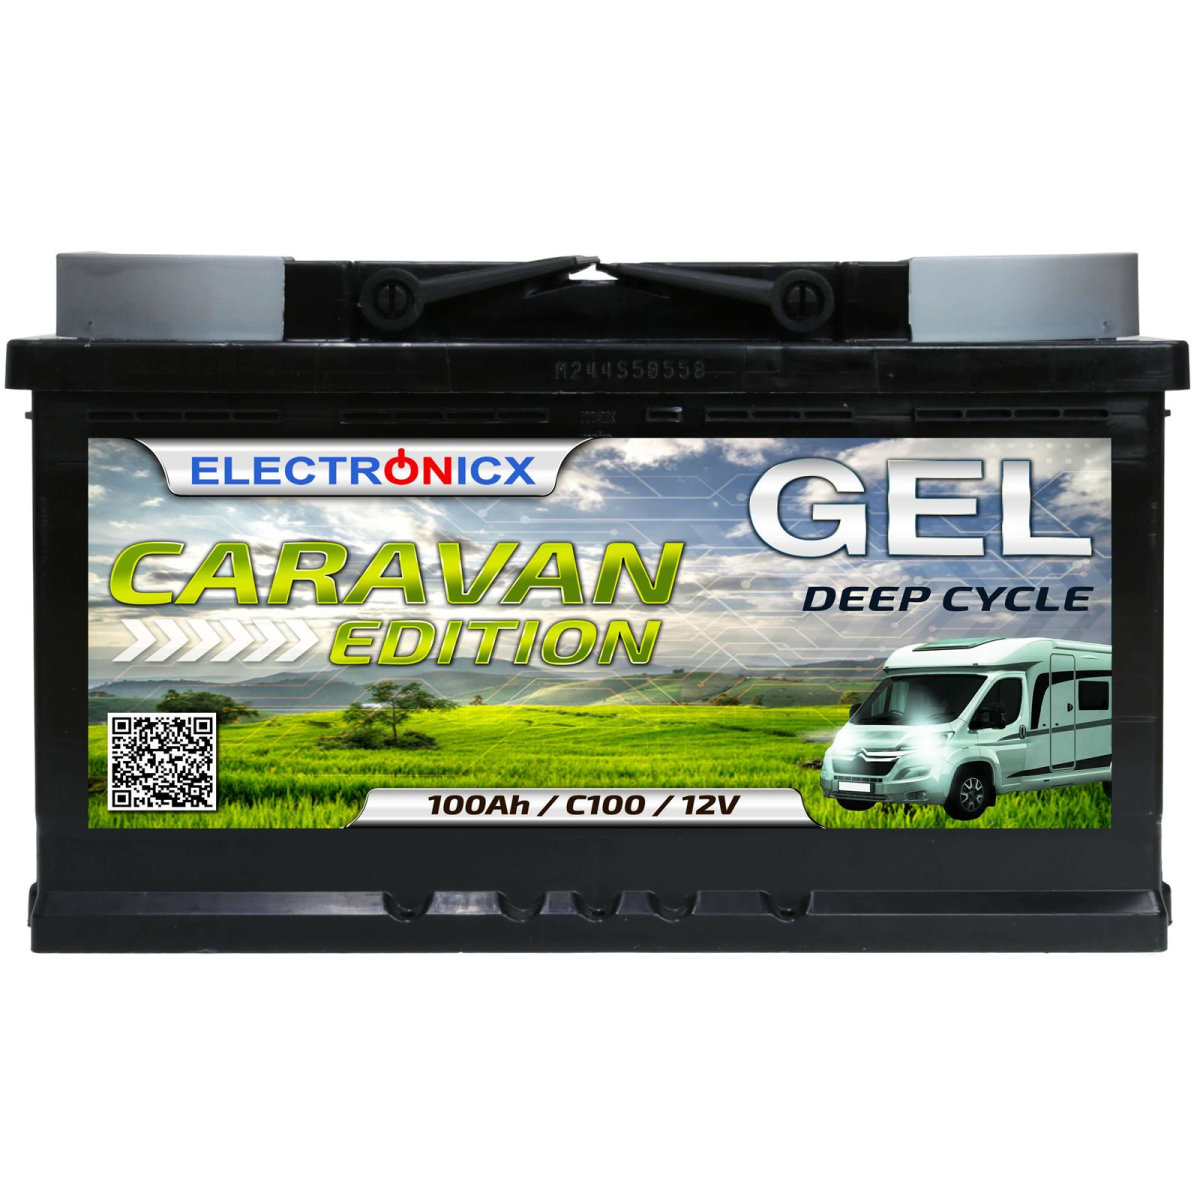 Electronicx Caravan Edition gel battery 100 ah 12v motorhome boat supply